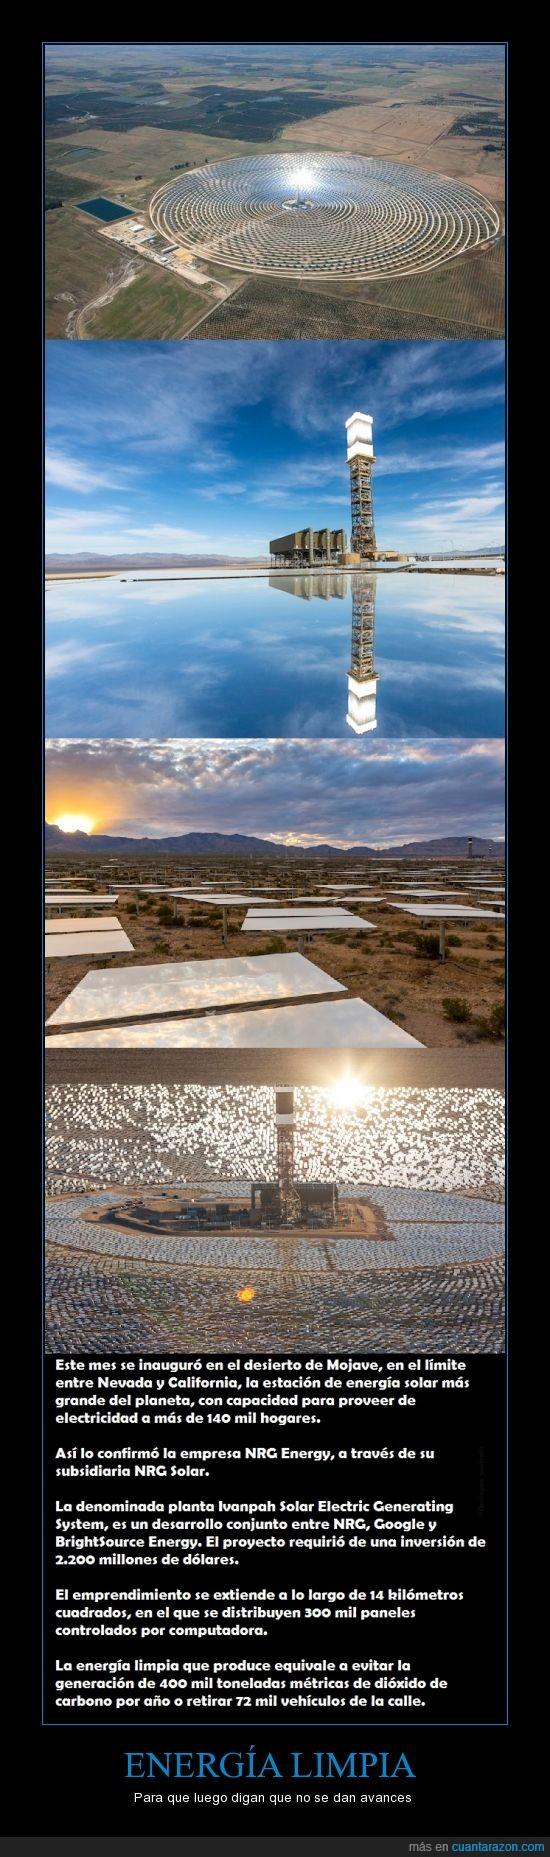 avances,California,energía,energía limpia,Ivanpah Solar Electric Generating System,Usa EUA